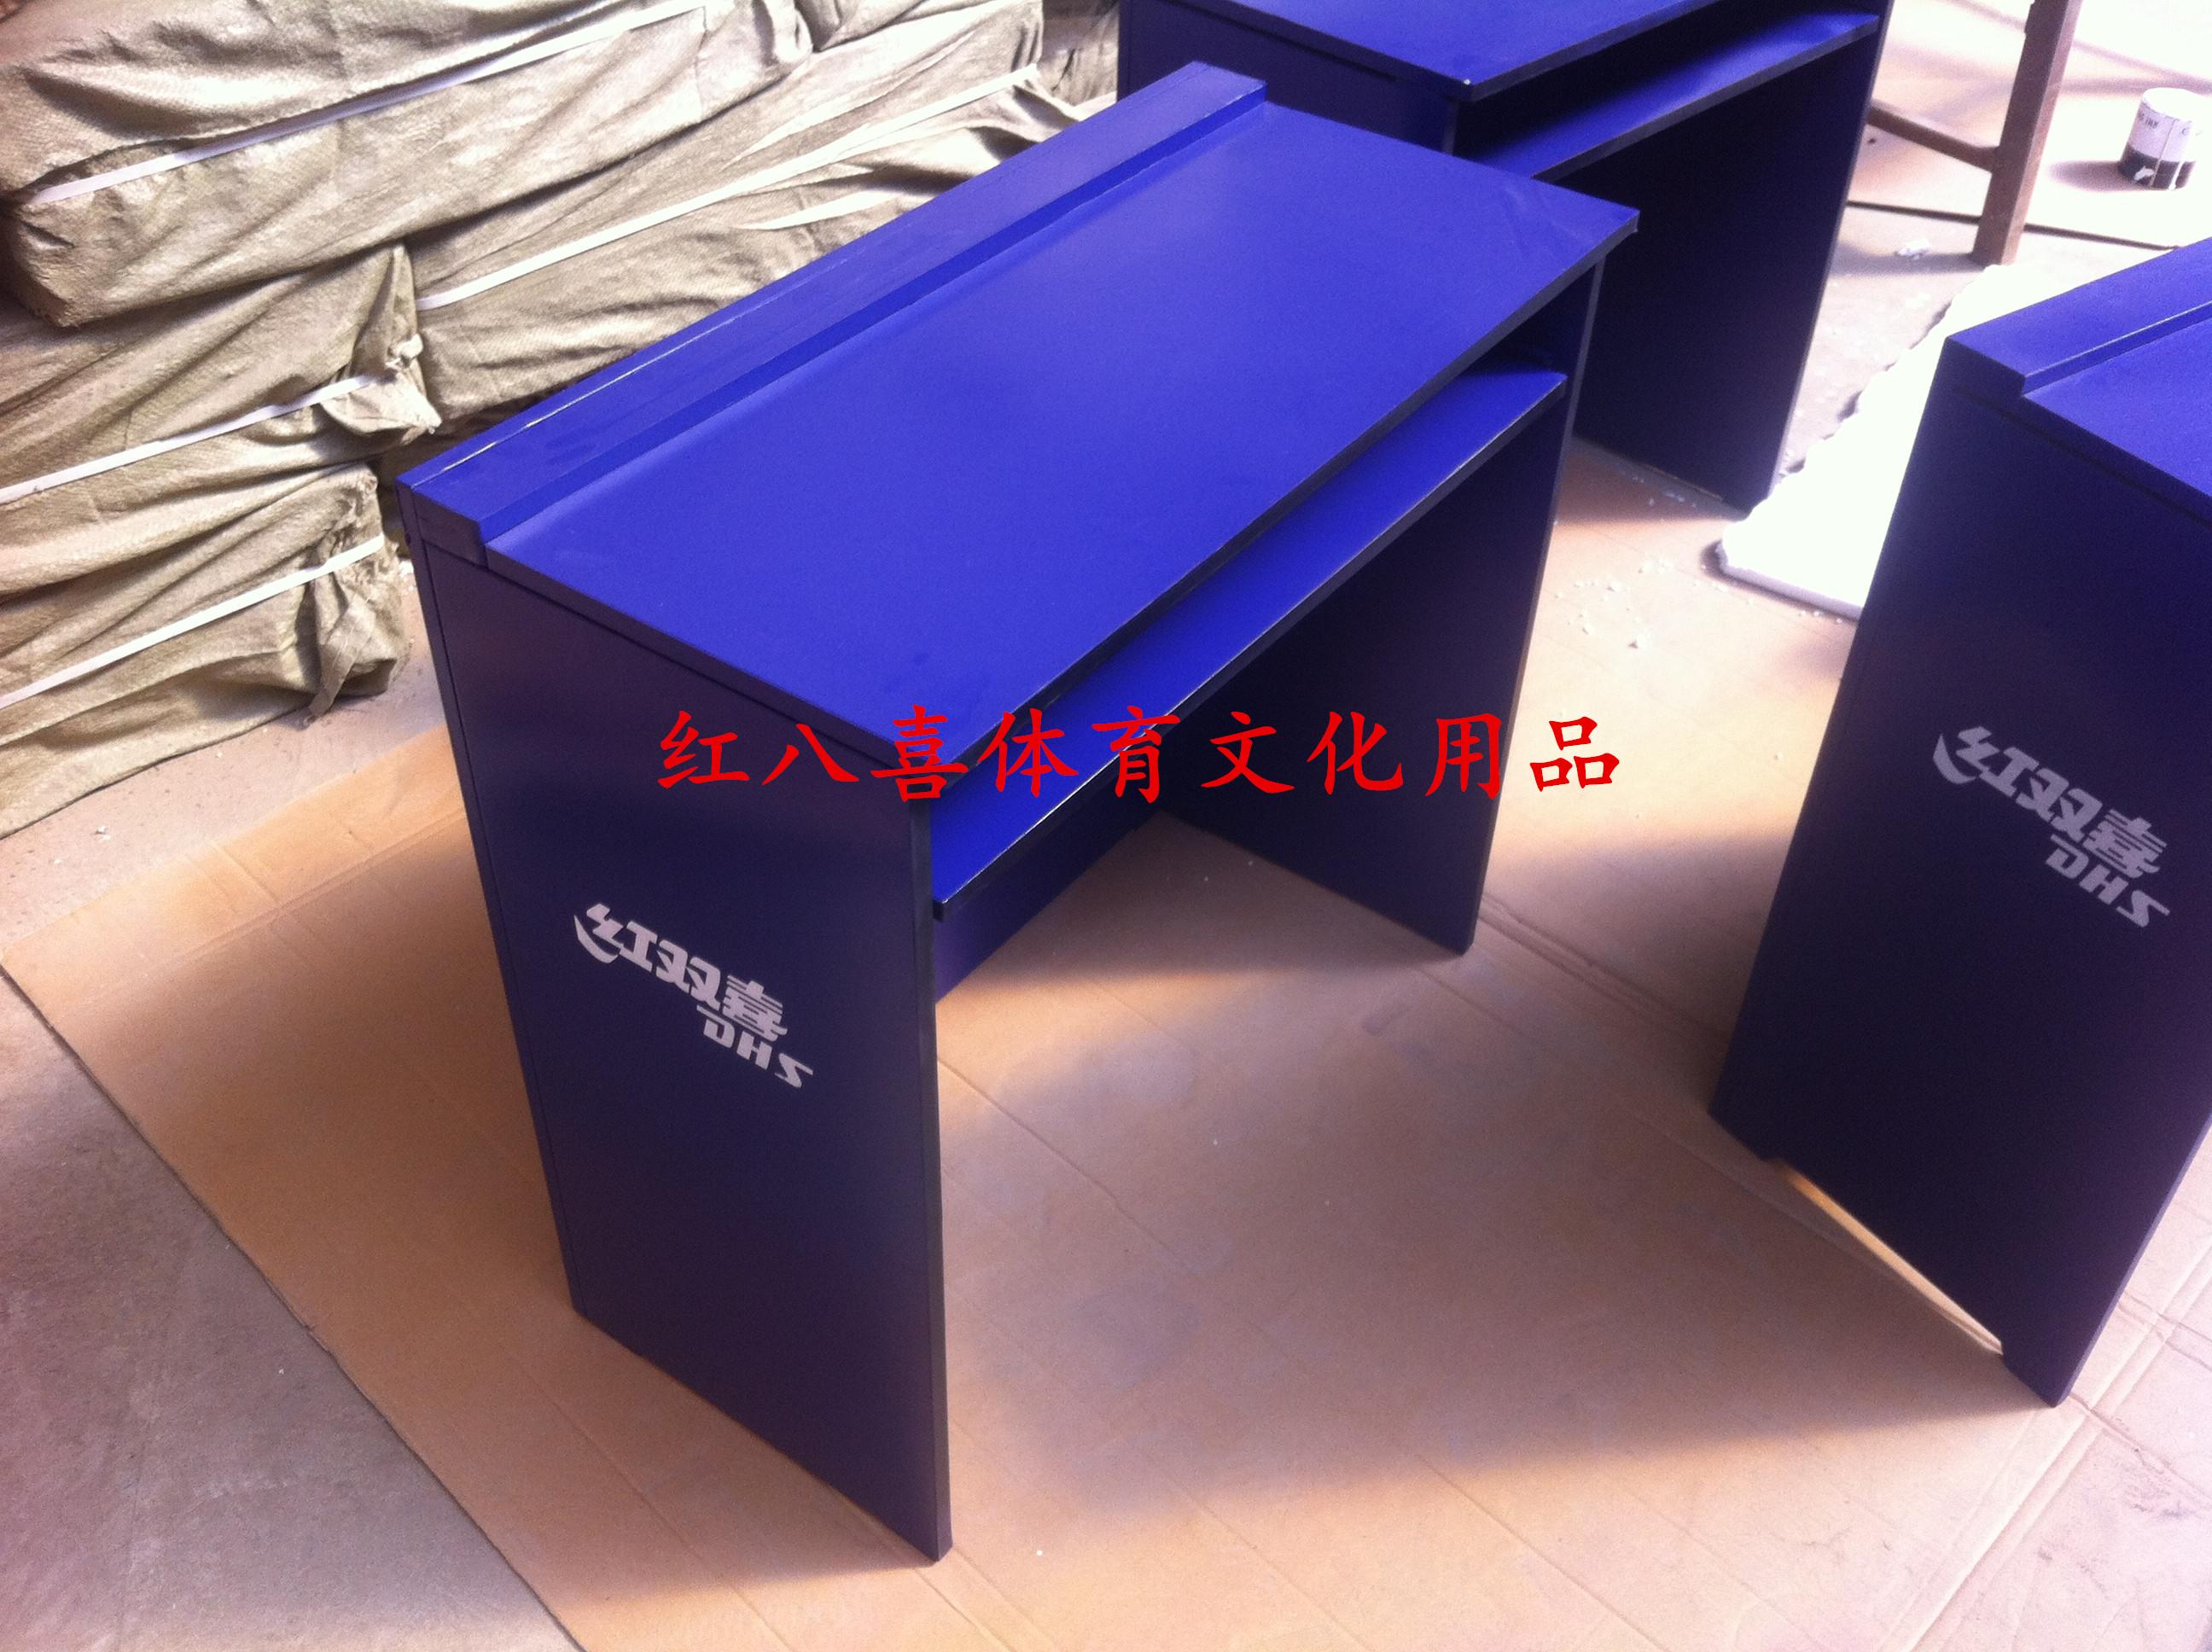 [RF01乒乓球台裁判桌球队比赛训练球台] со складыванием [记分台记分桌]